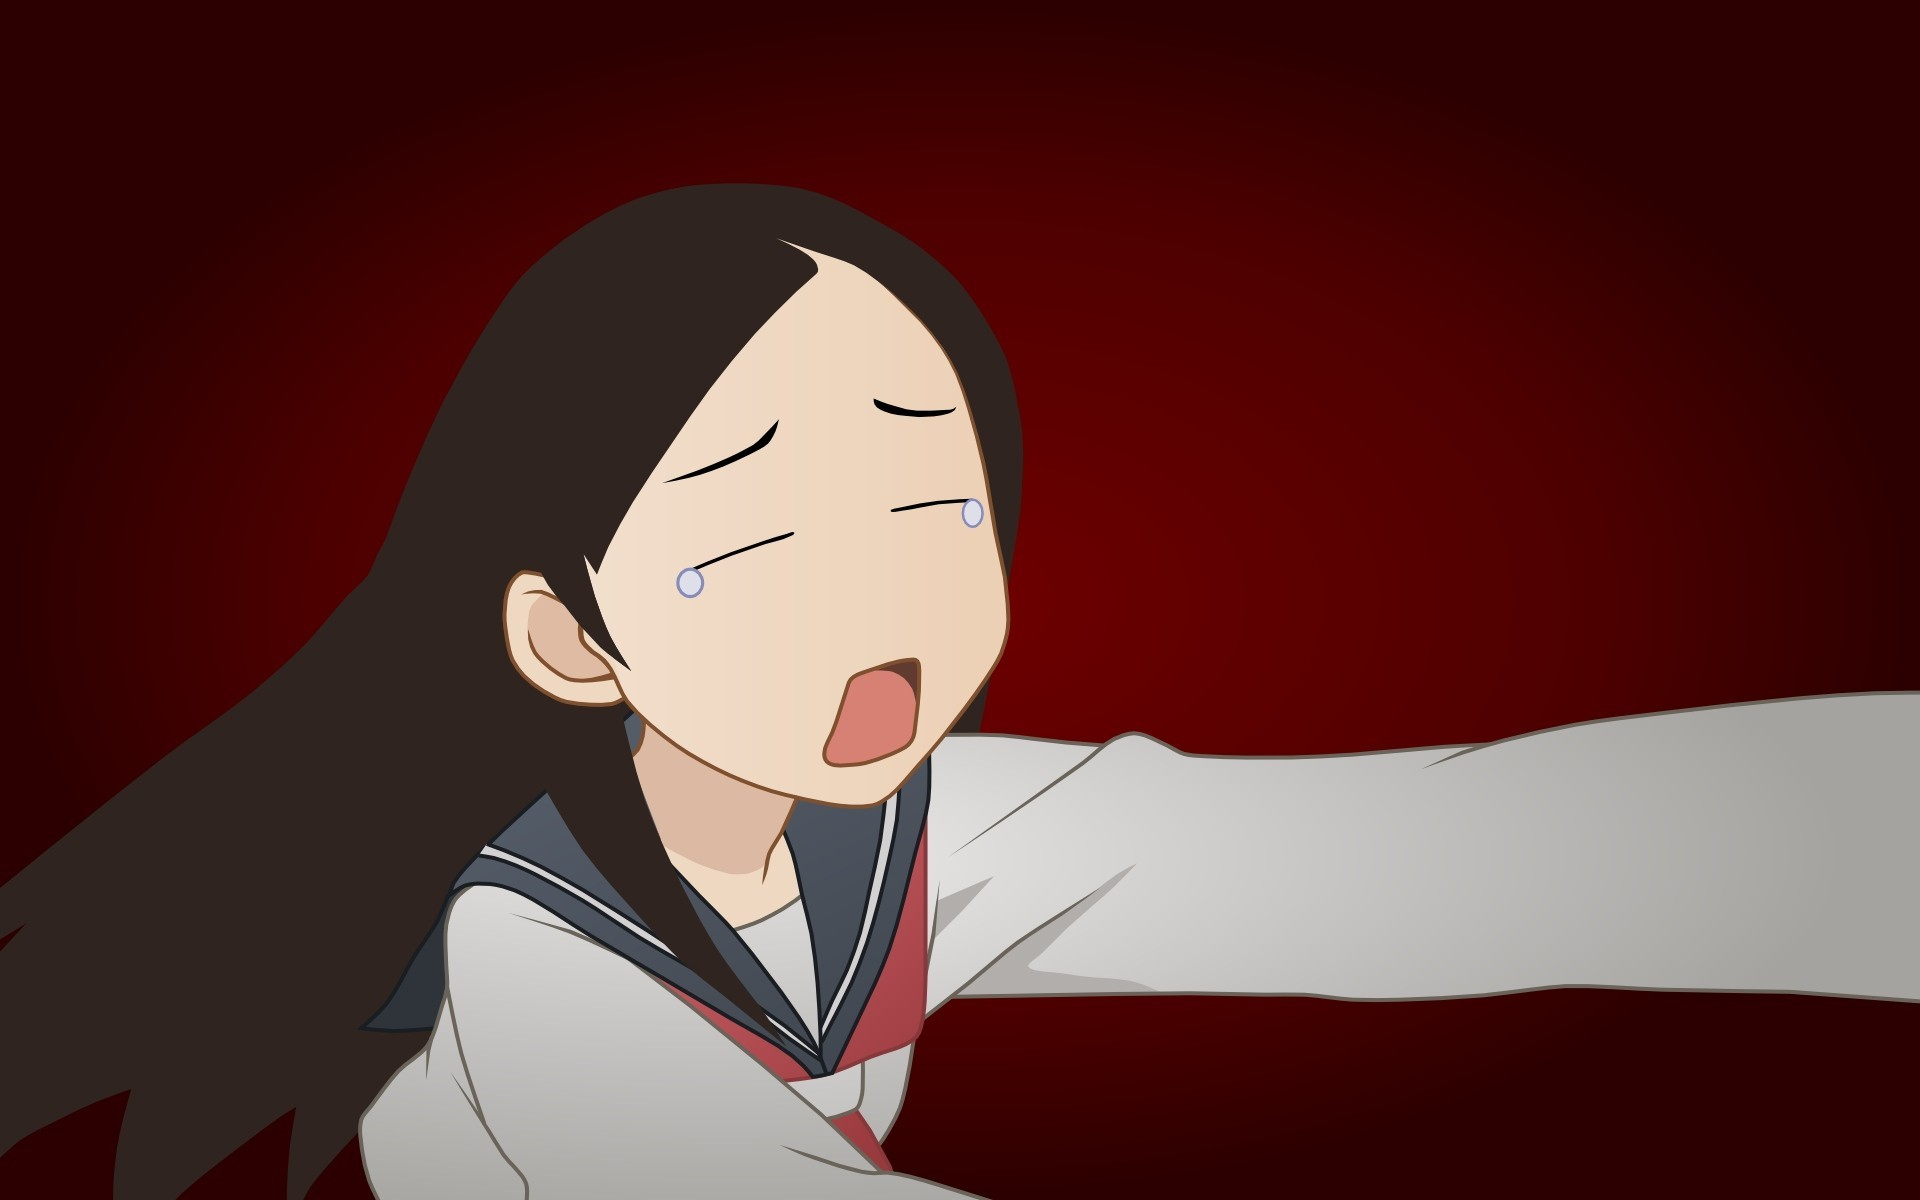 manga anime anime girls tears